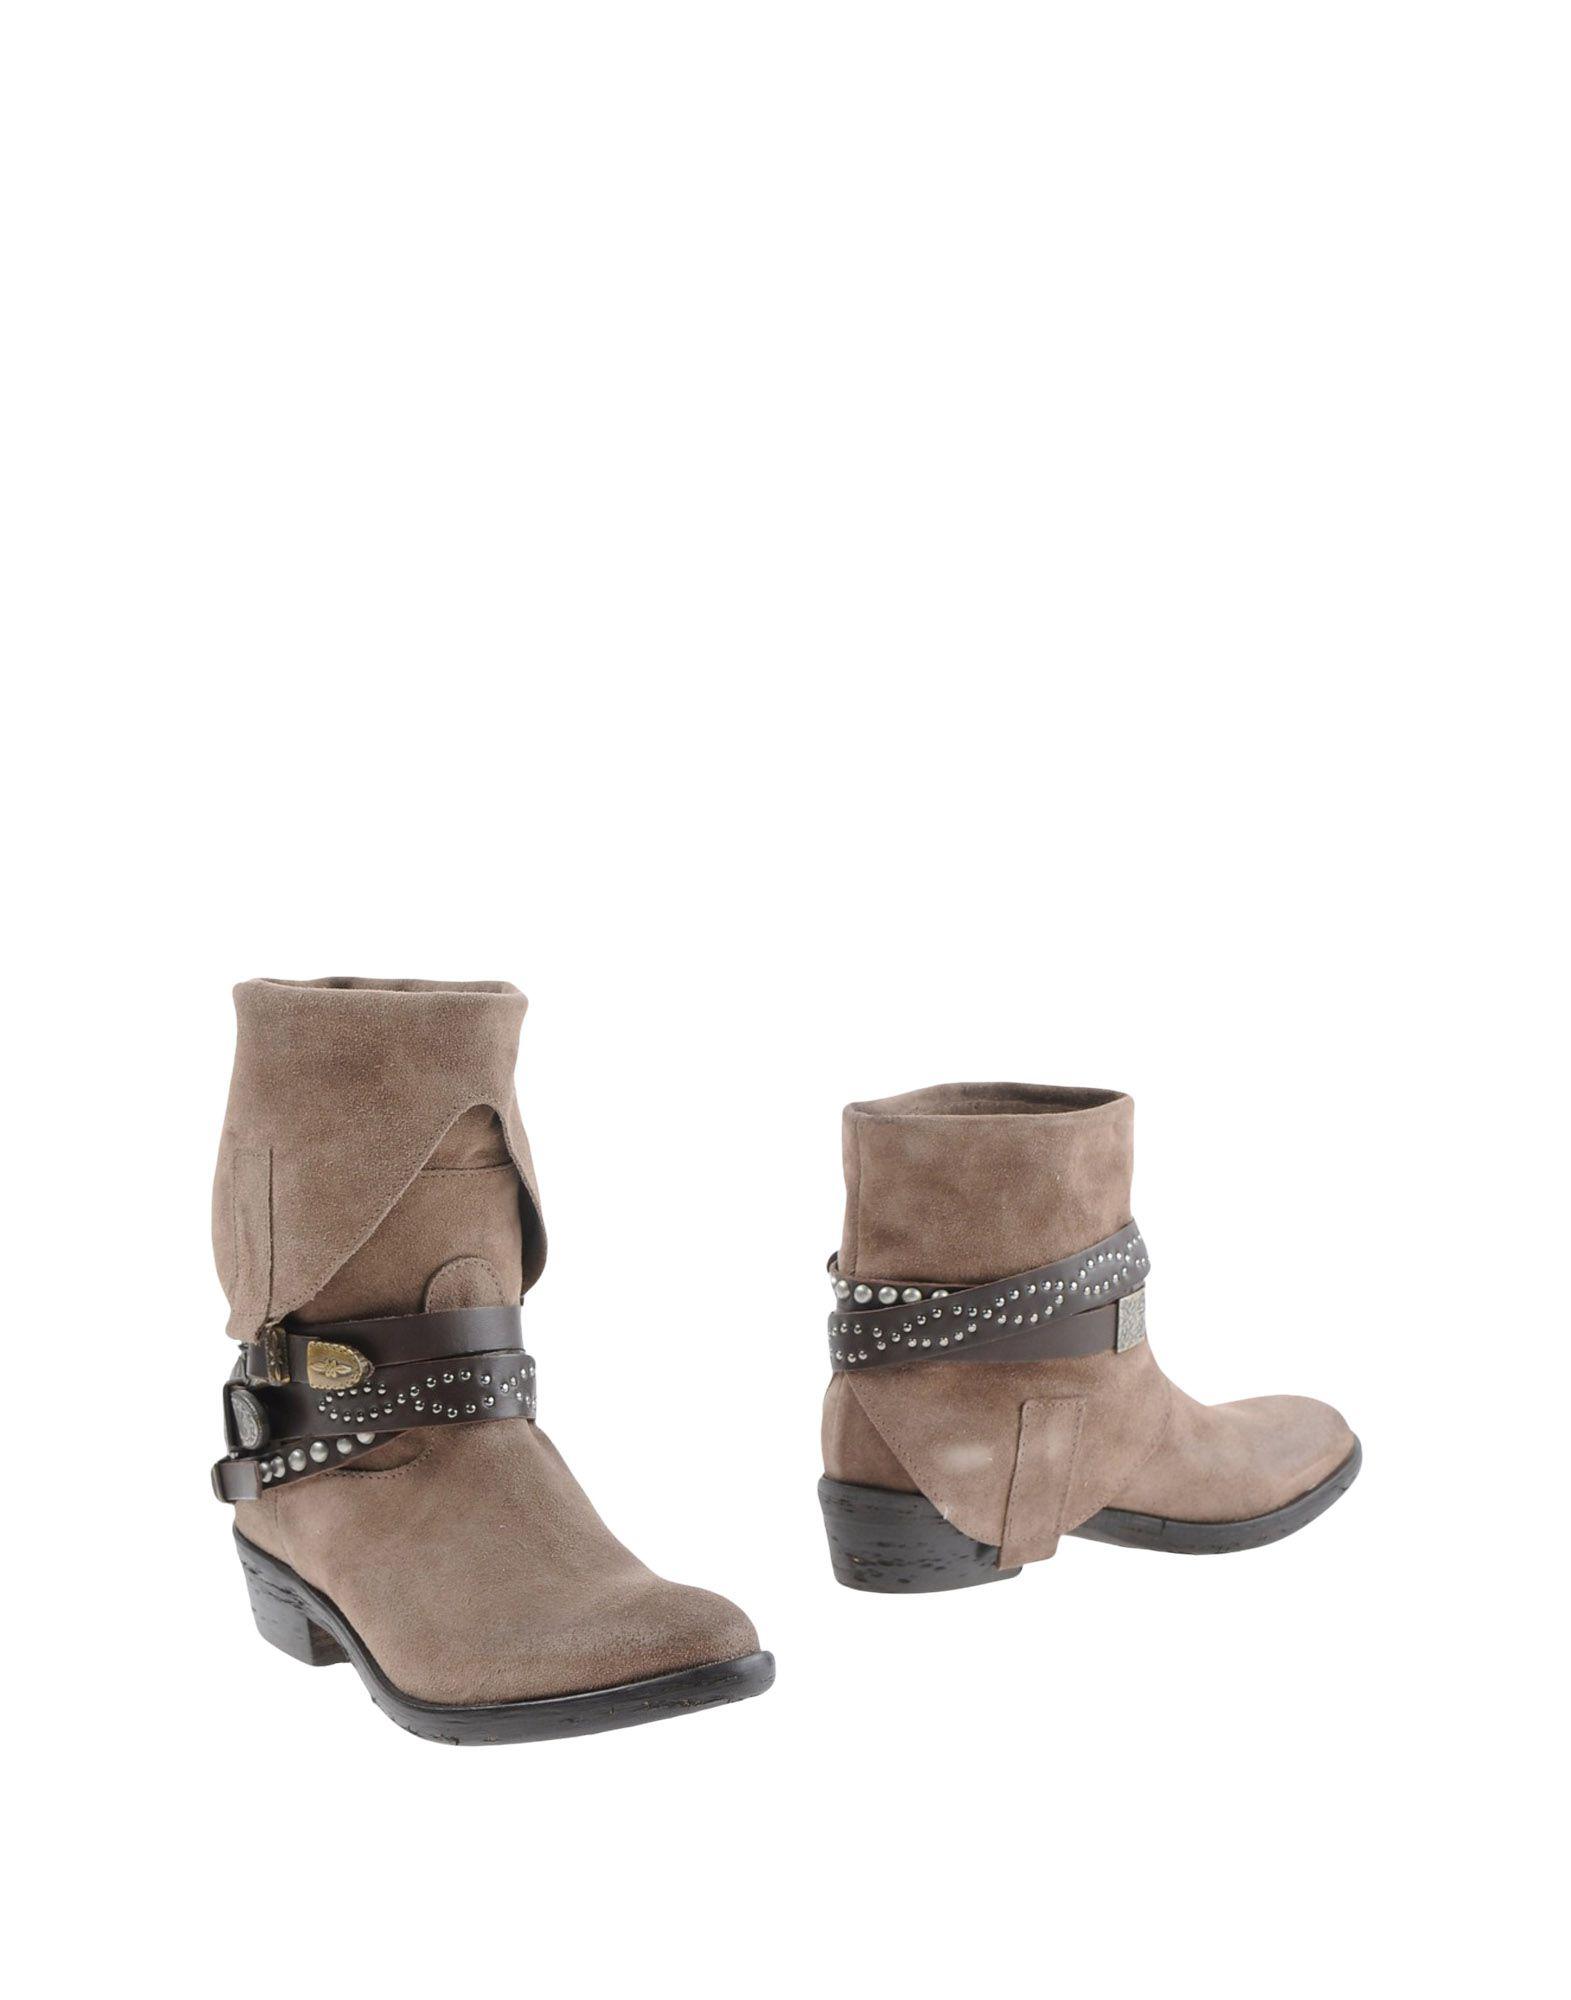 OSVALDO ROSSI Полусапоги и высокие ботинки osvaldo rossi полусапоги и высокие ботинки